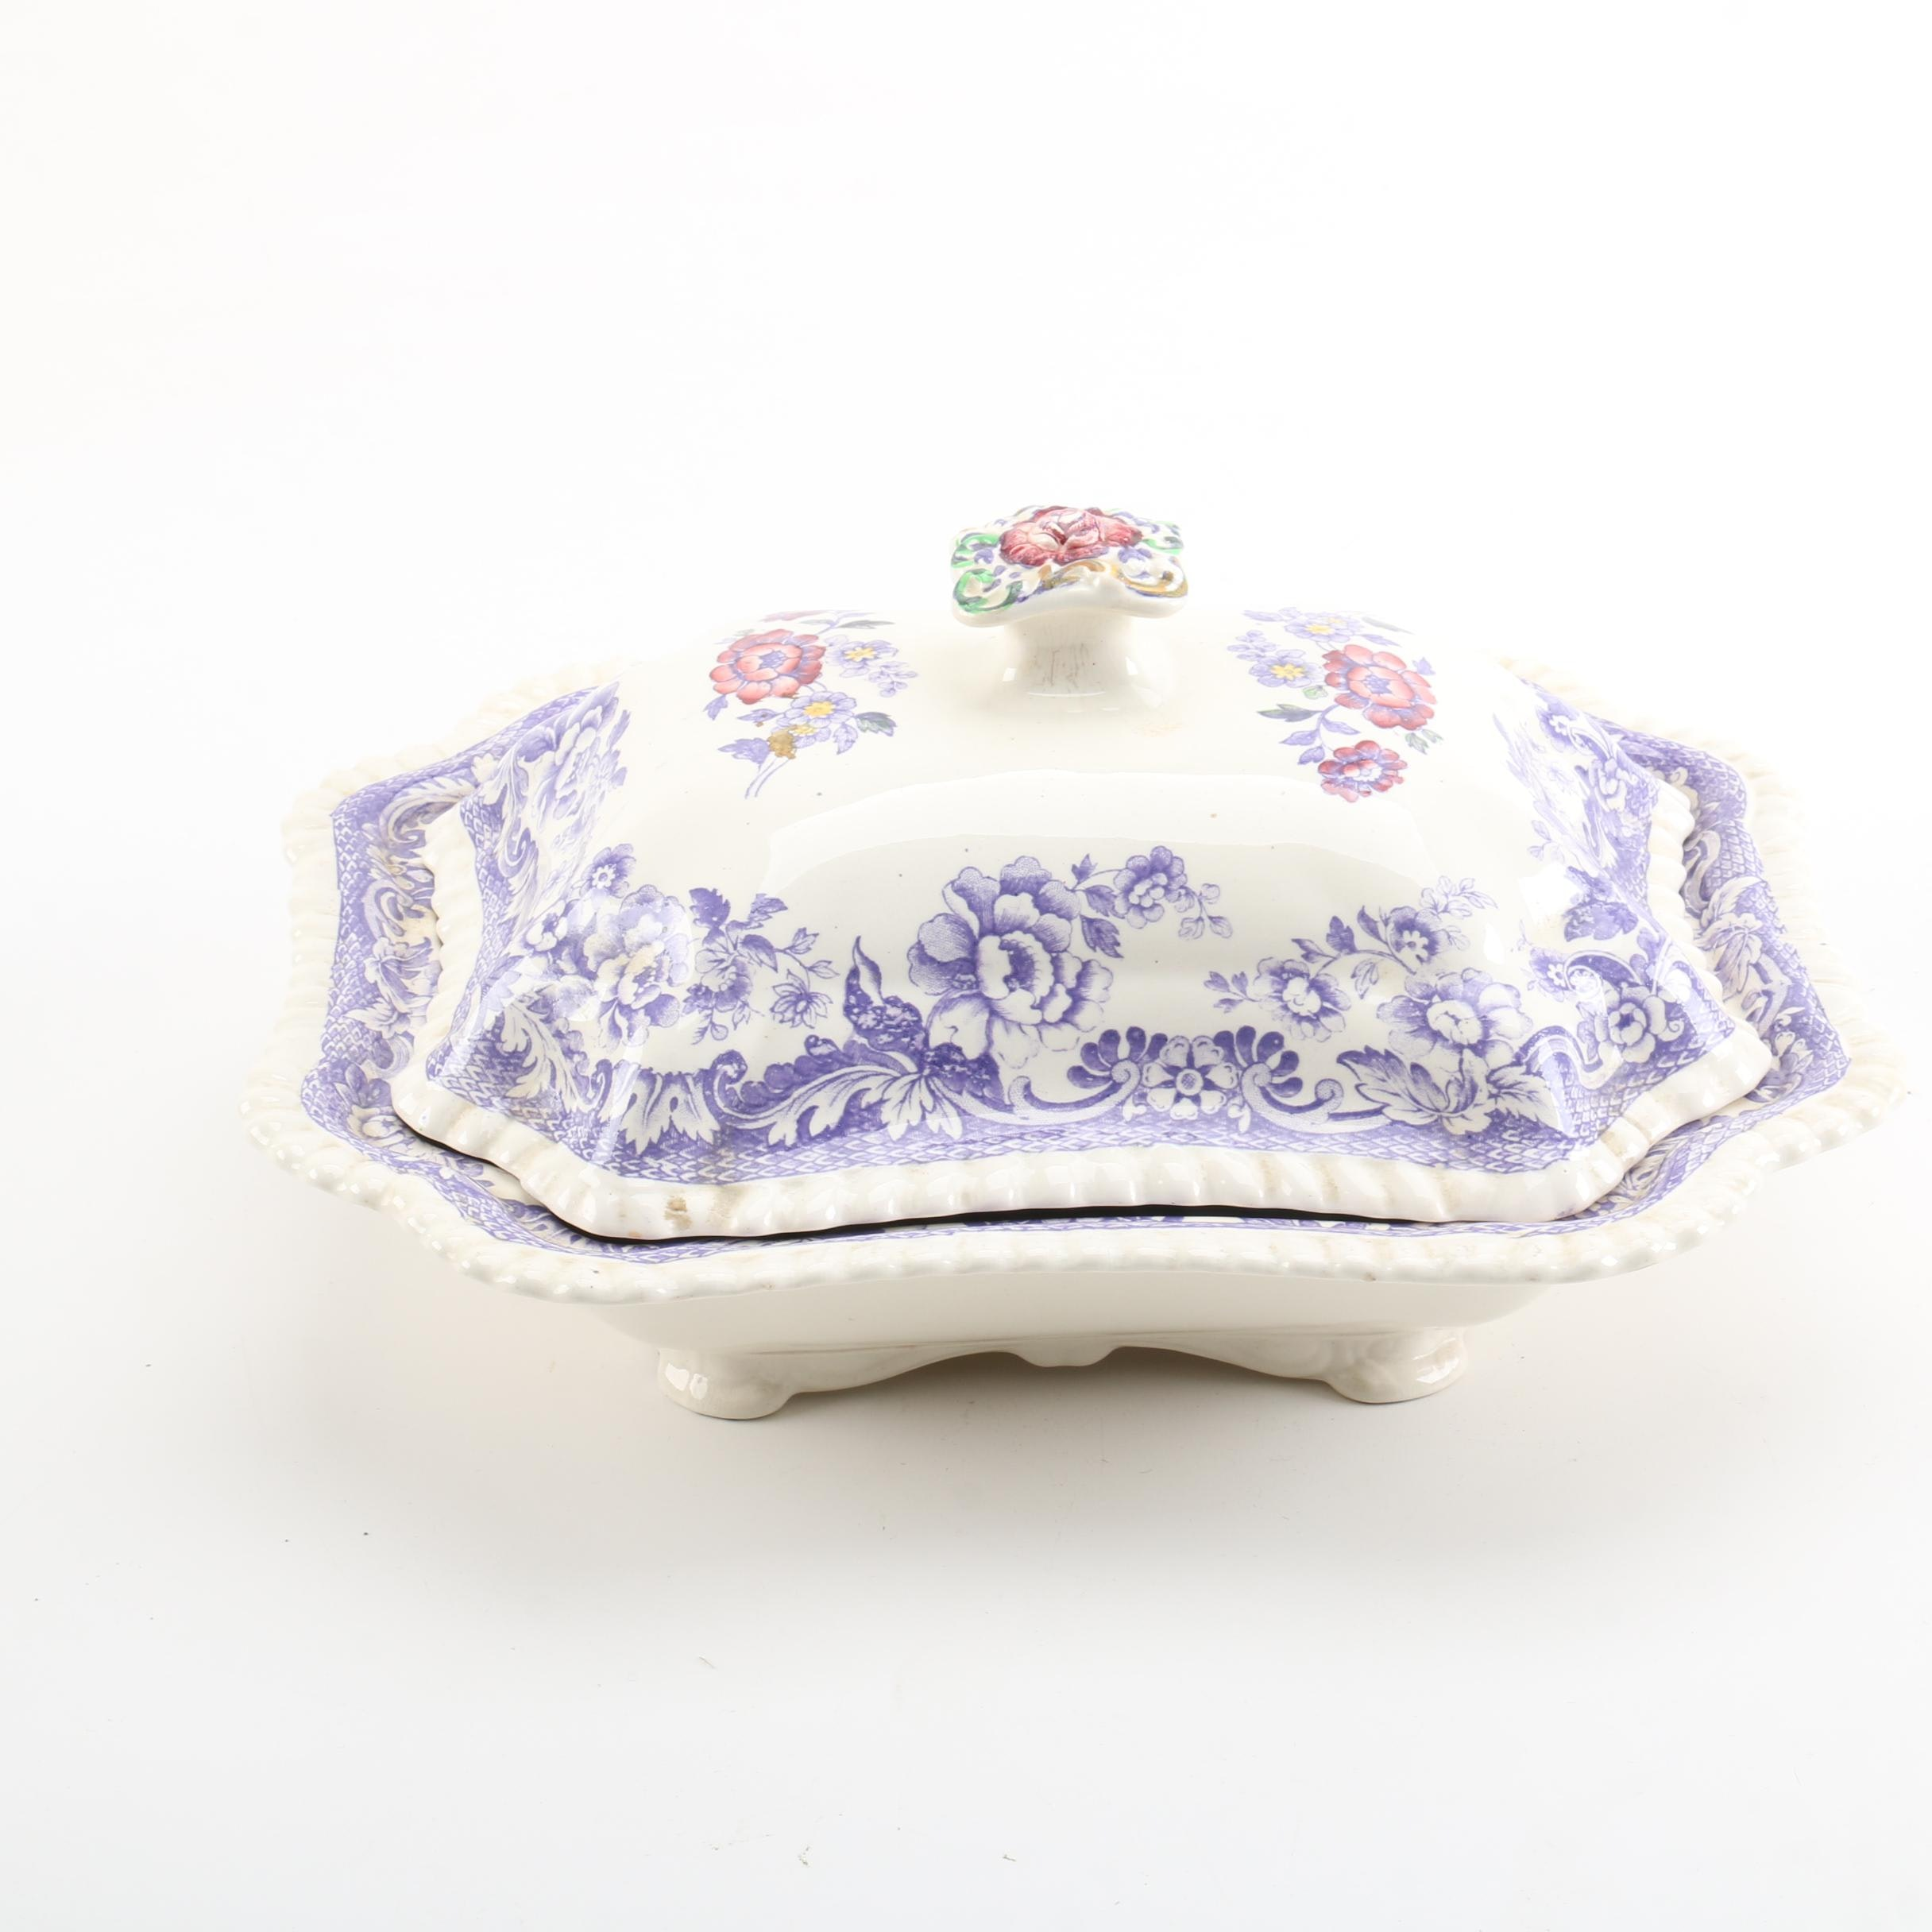 Vintage Copeland Spode Covered Ceramic Vegetable Dish